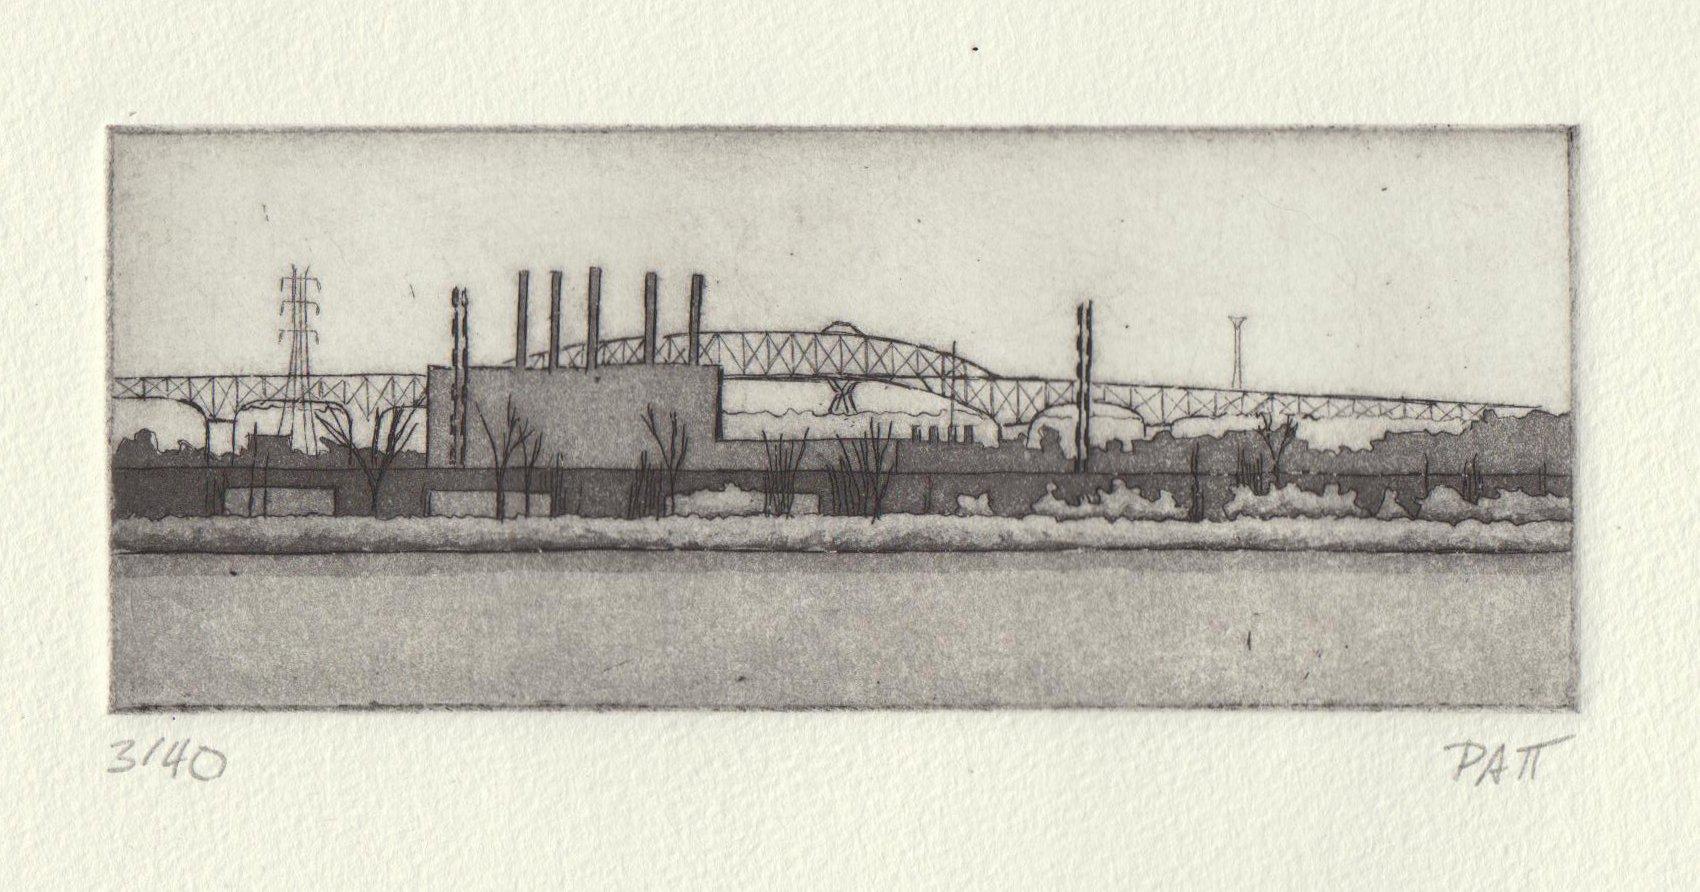 Pulaski Skyway - etching 3of40.jpeg